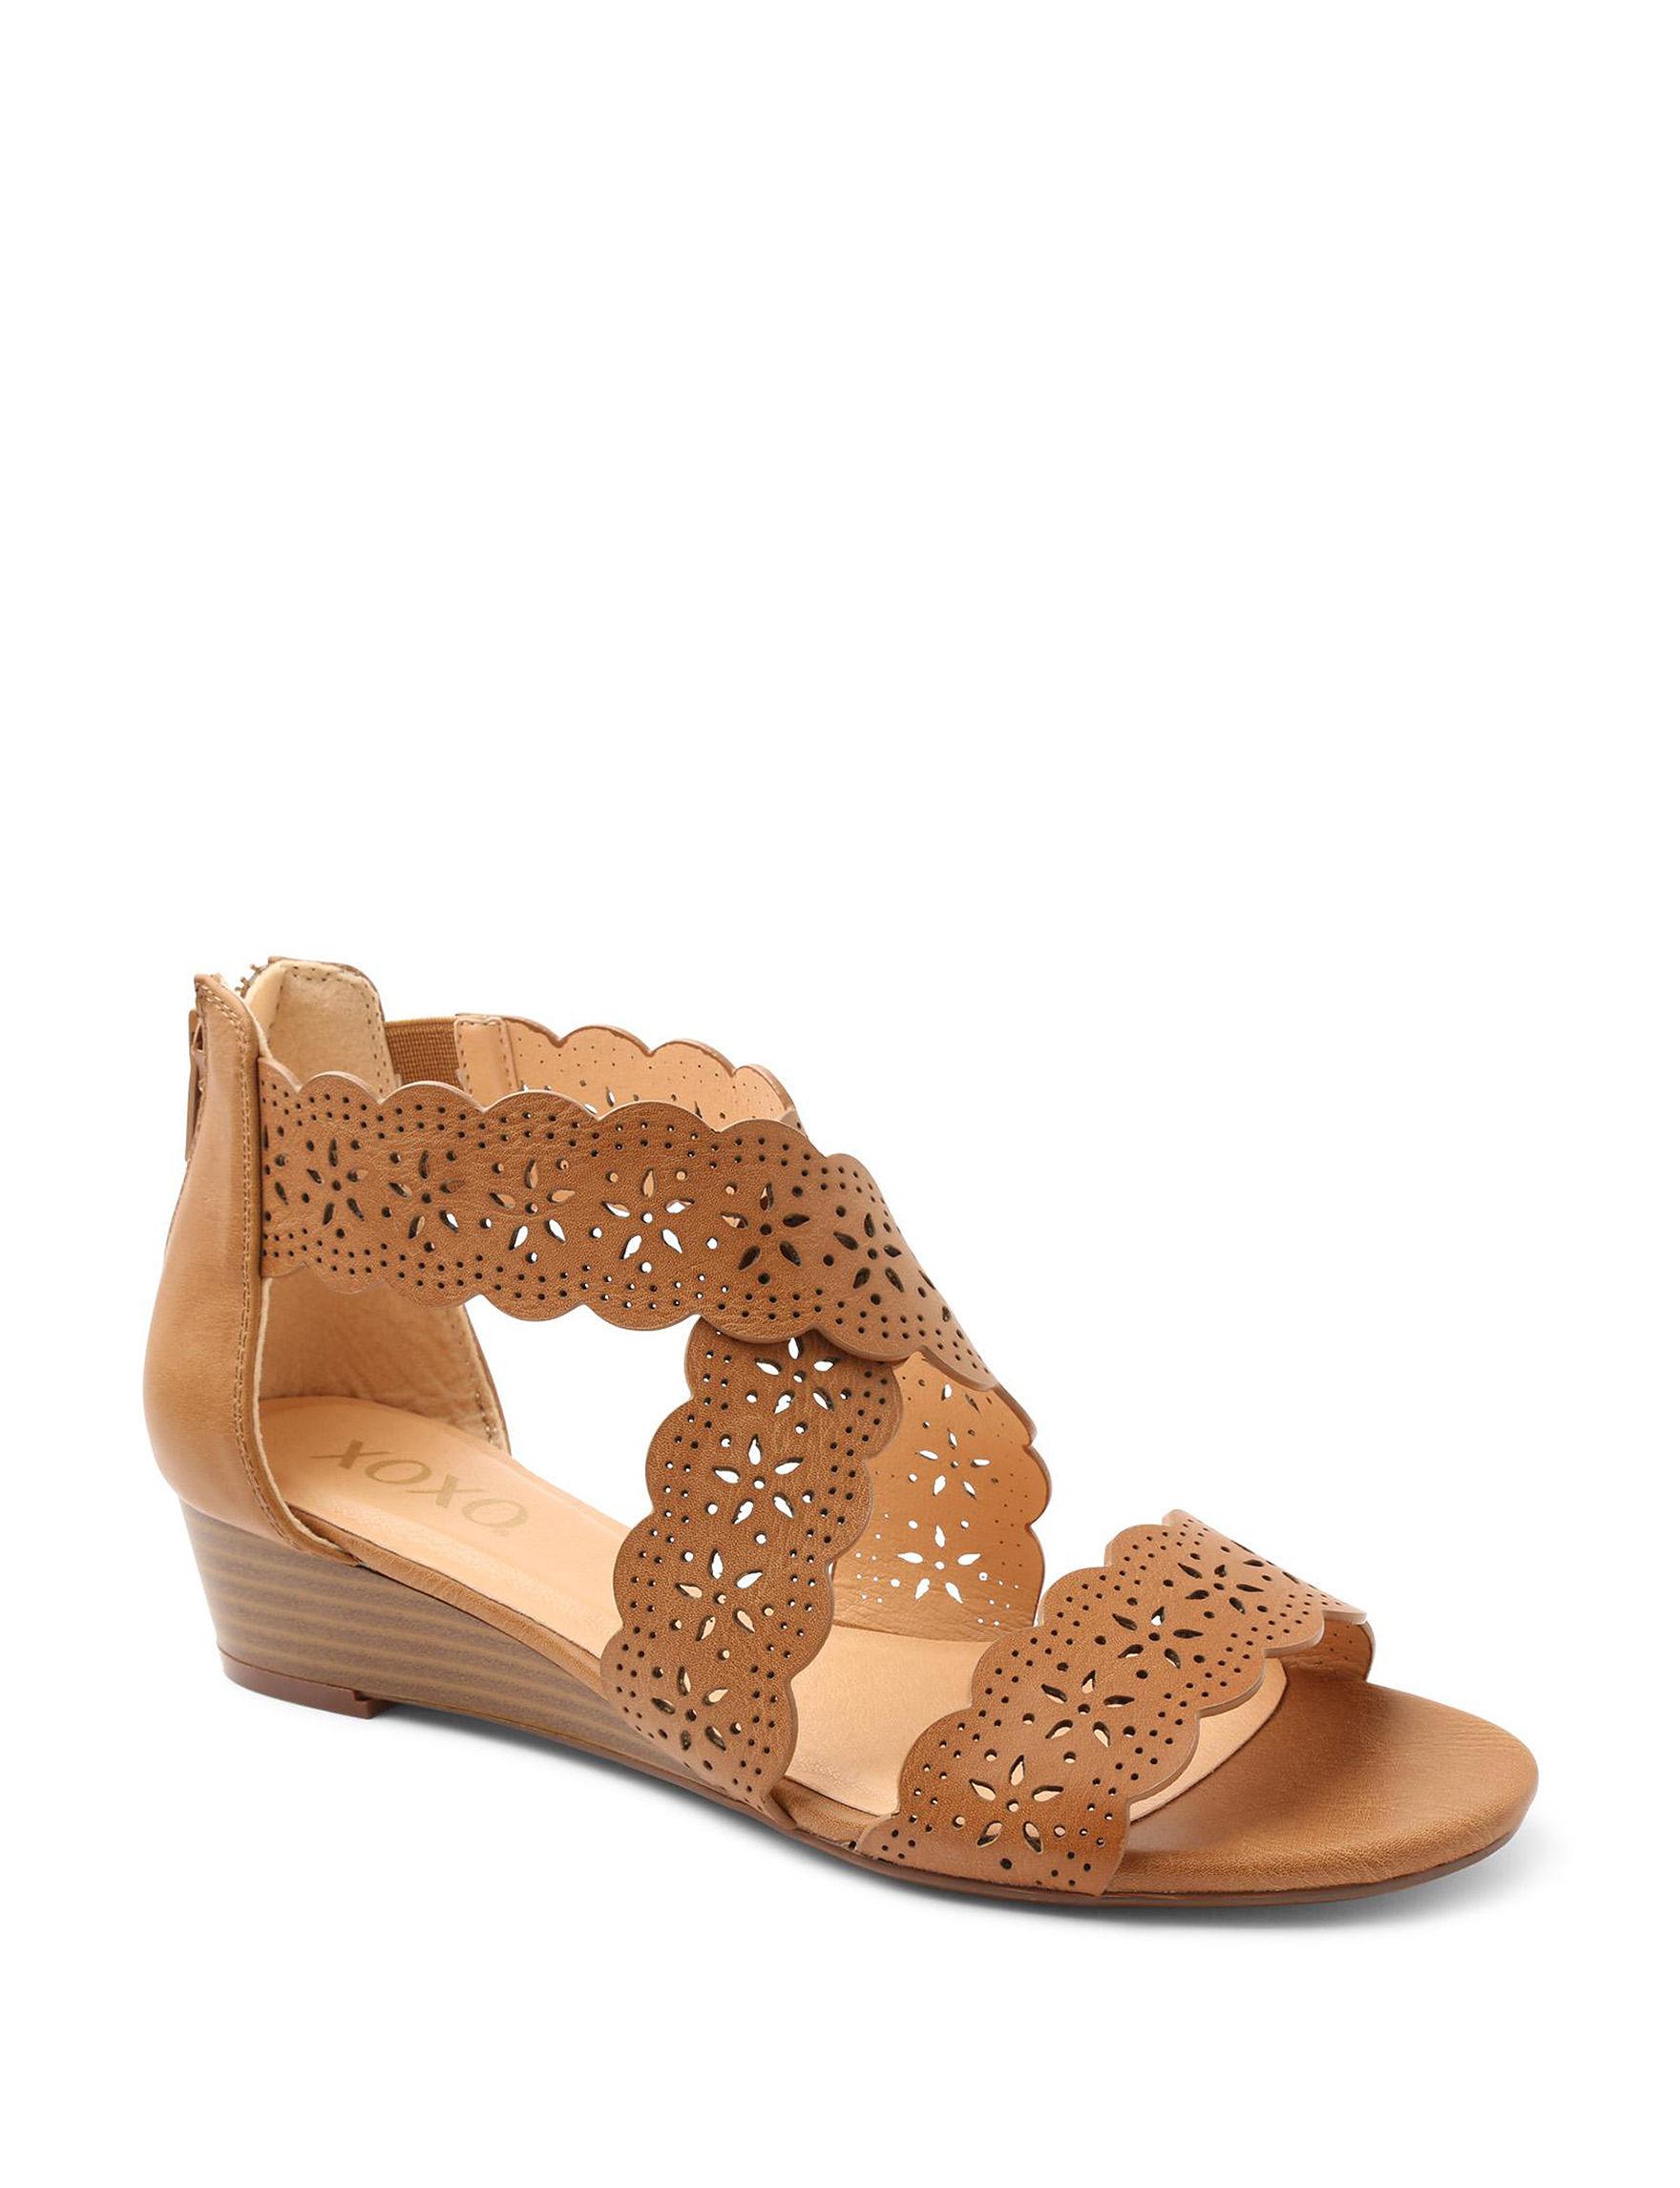 XOXO Tan Wedge Sandals